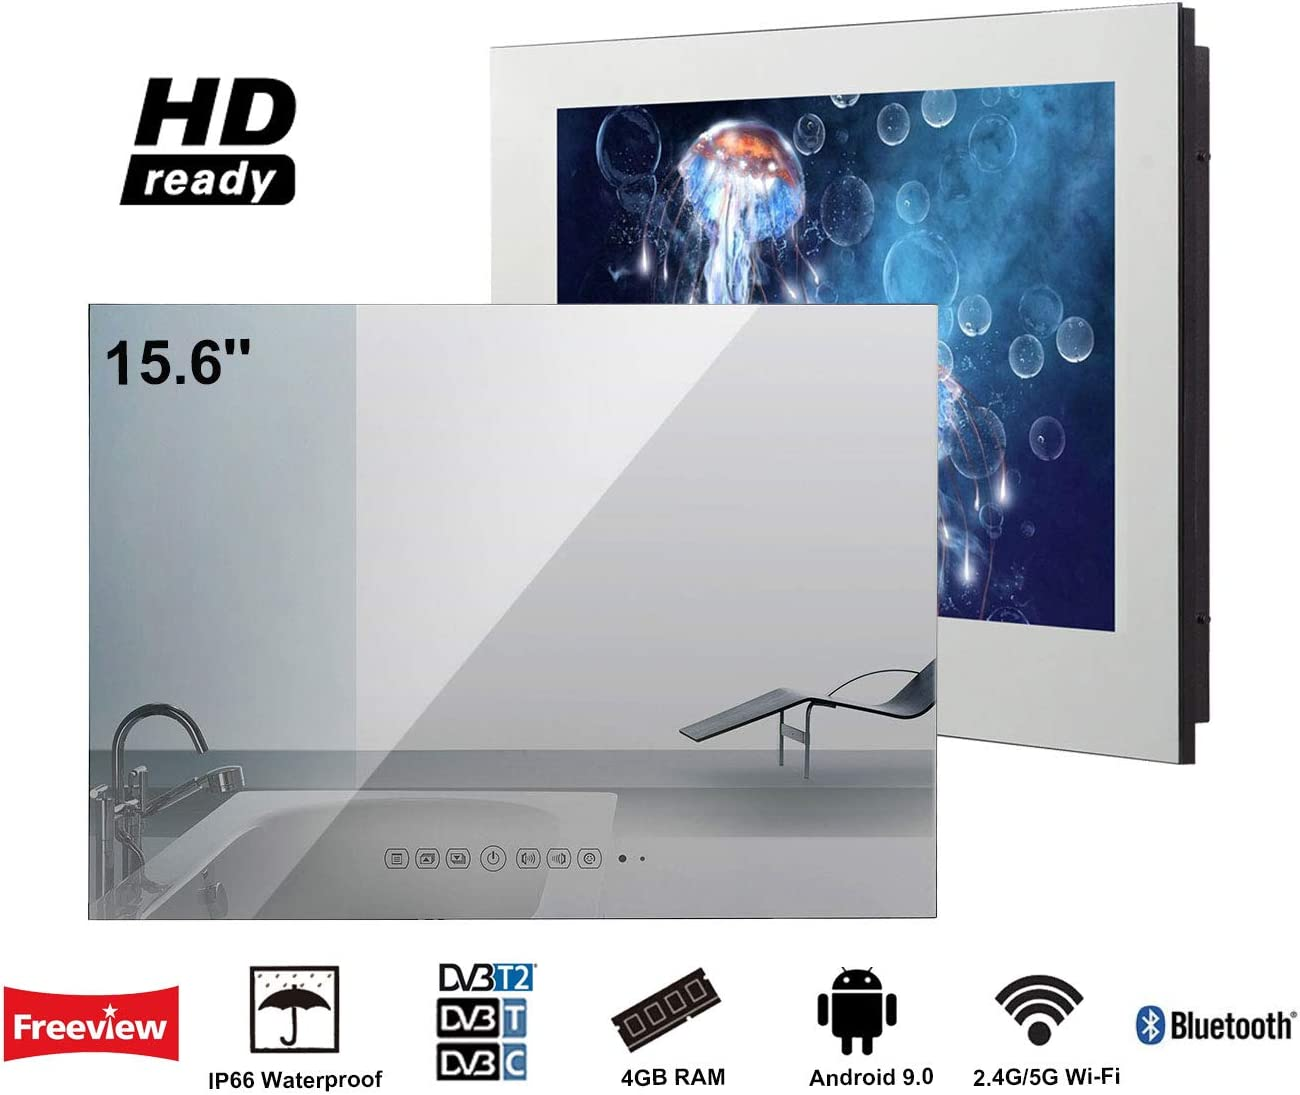 Soulaca innovativtv LED Andriod Smart TV Baño Espejo Frontal 15.6 ...